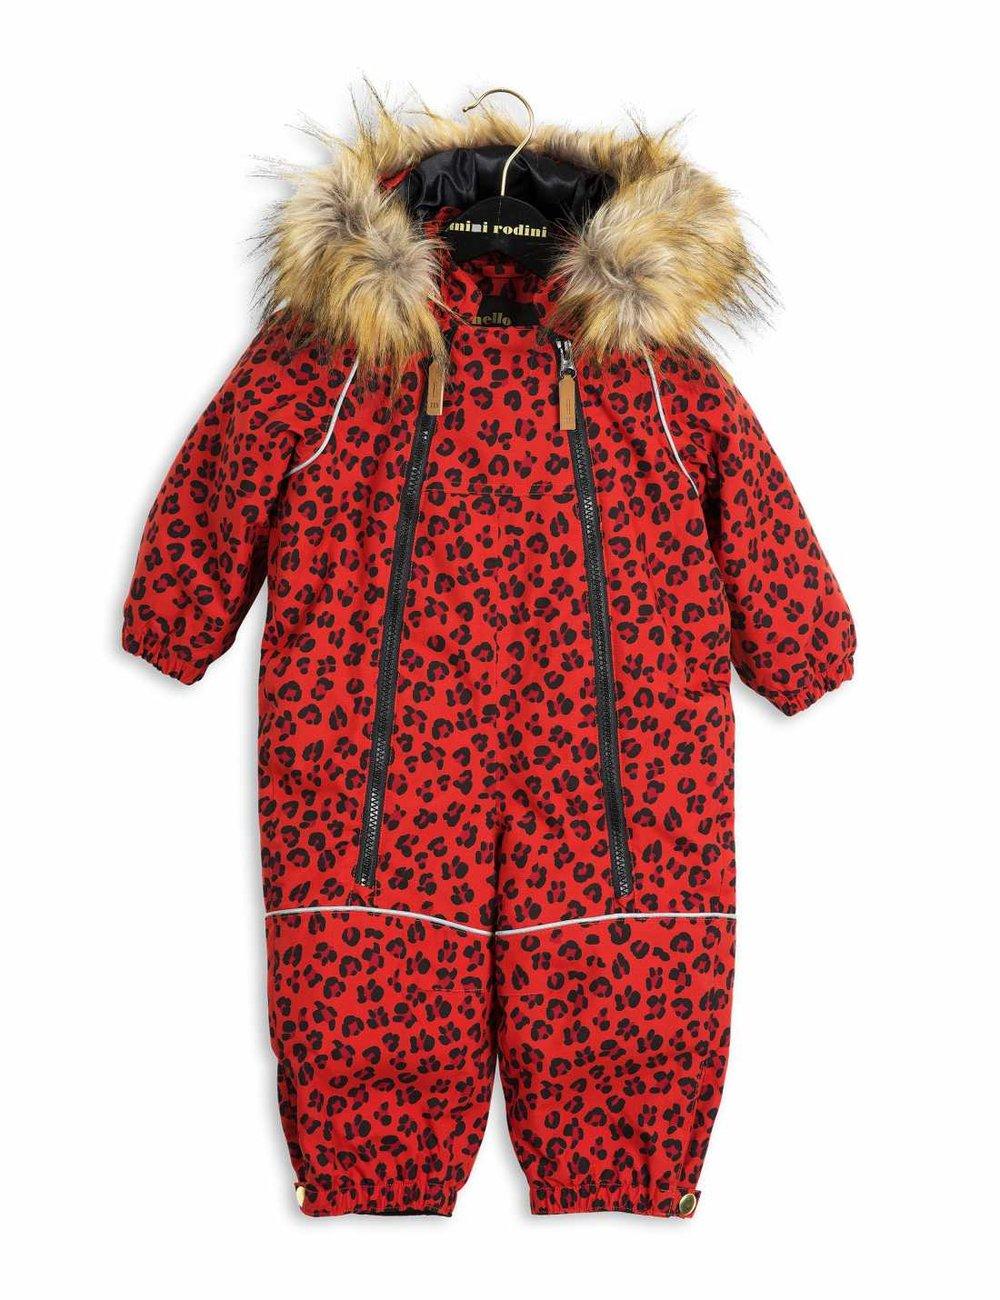 Wrap Up Warm In This Season's Most Stylish Ski Wear